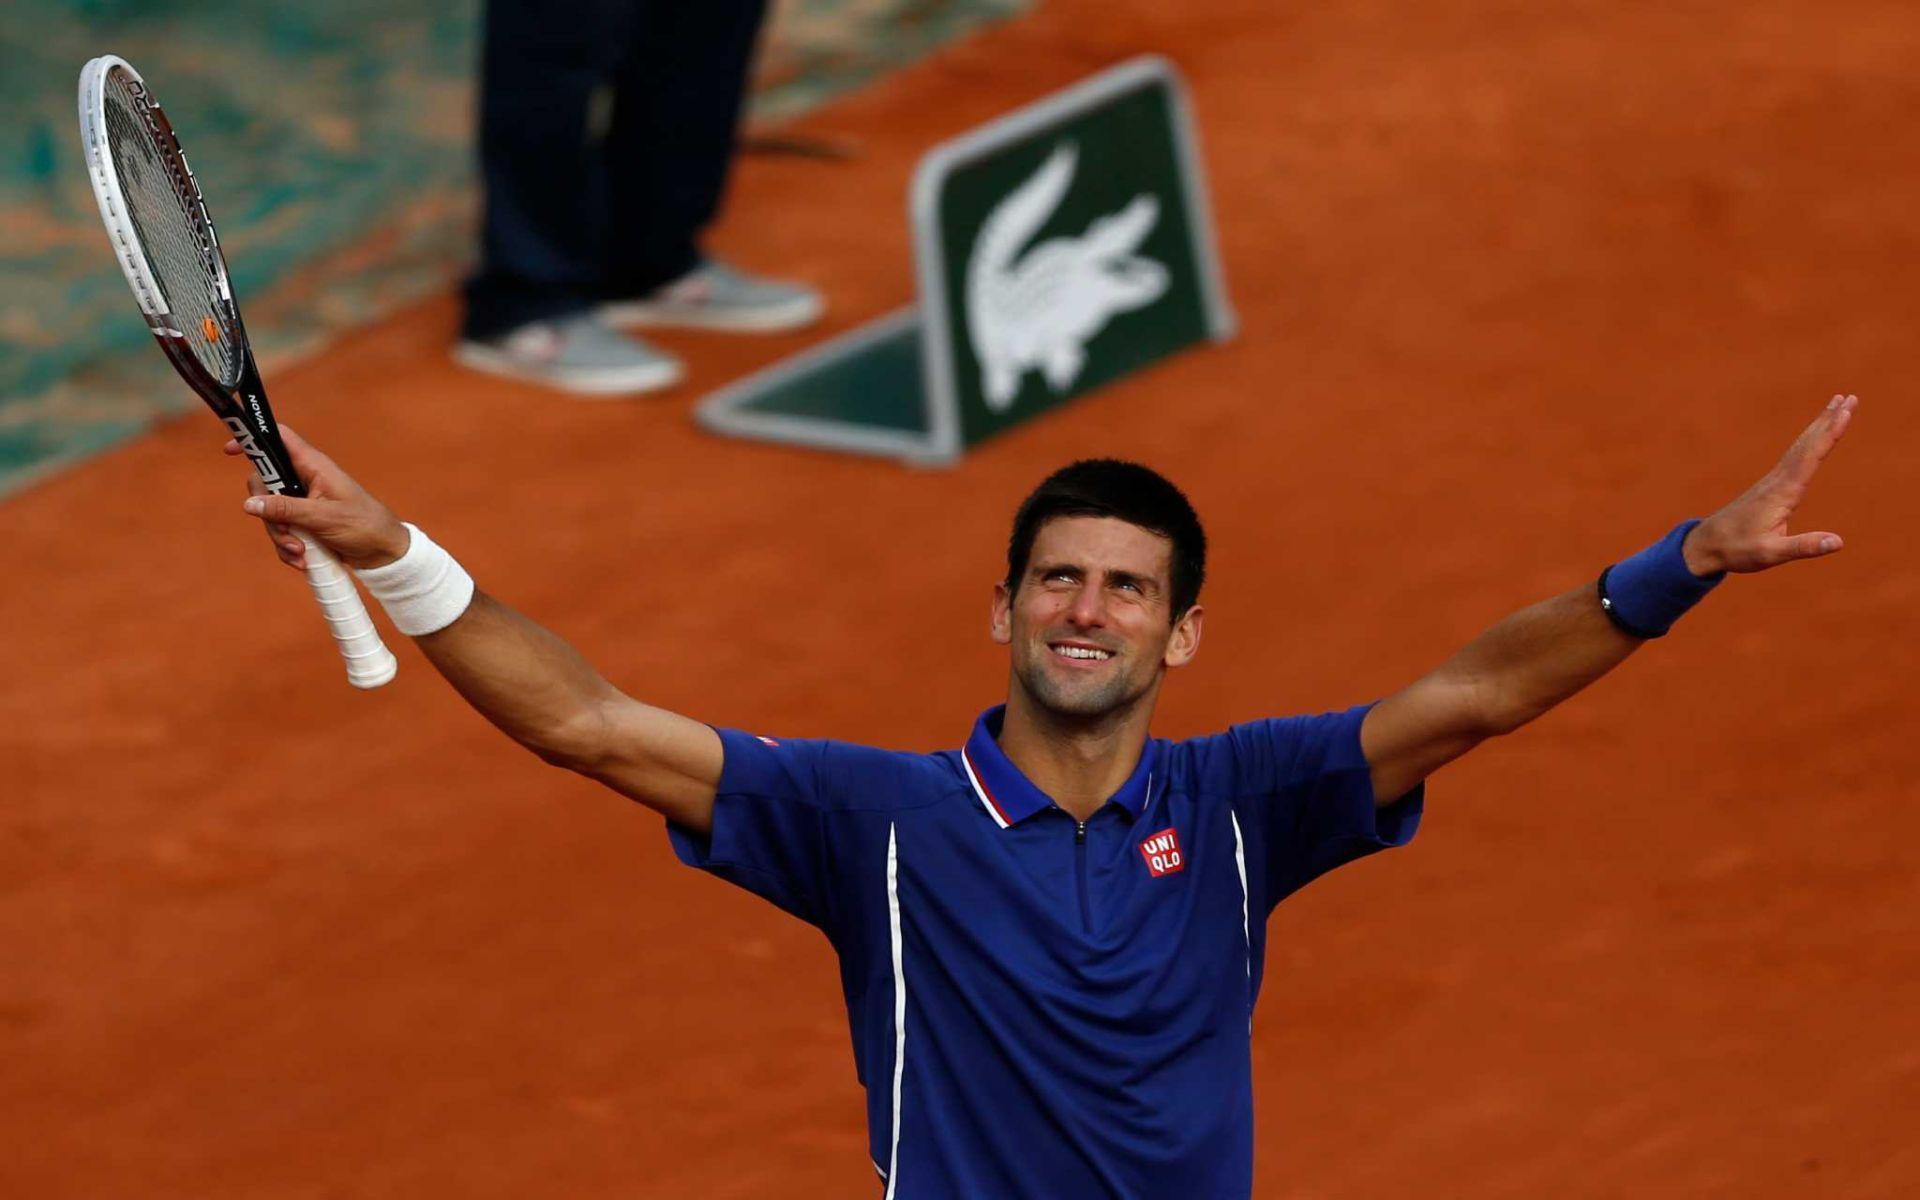 Novak Djokovic New Wallpapers #29965 Wallpaper | Risewall.